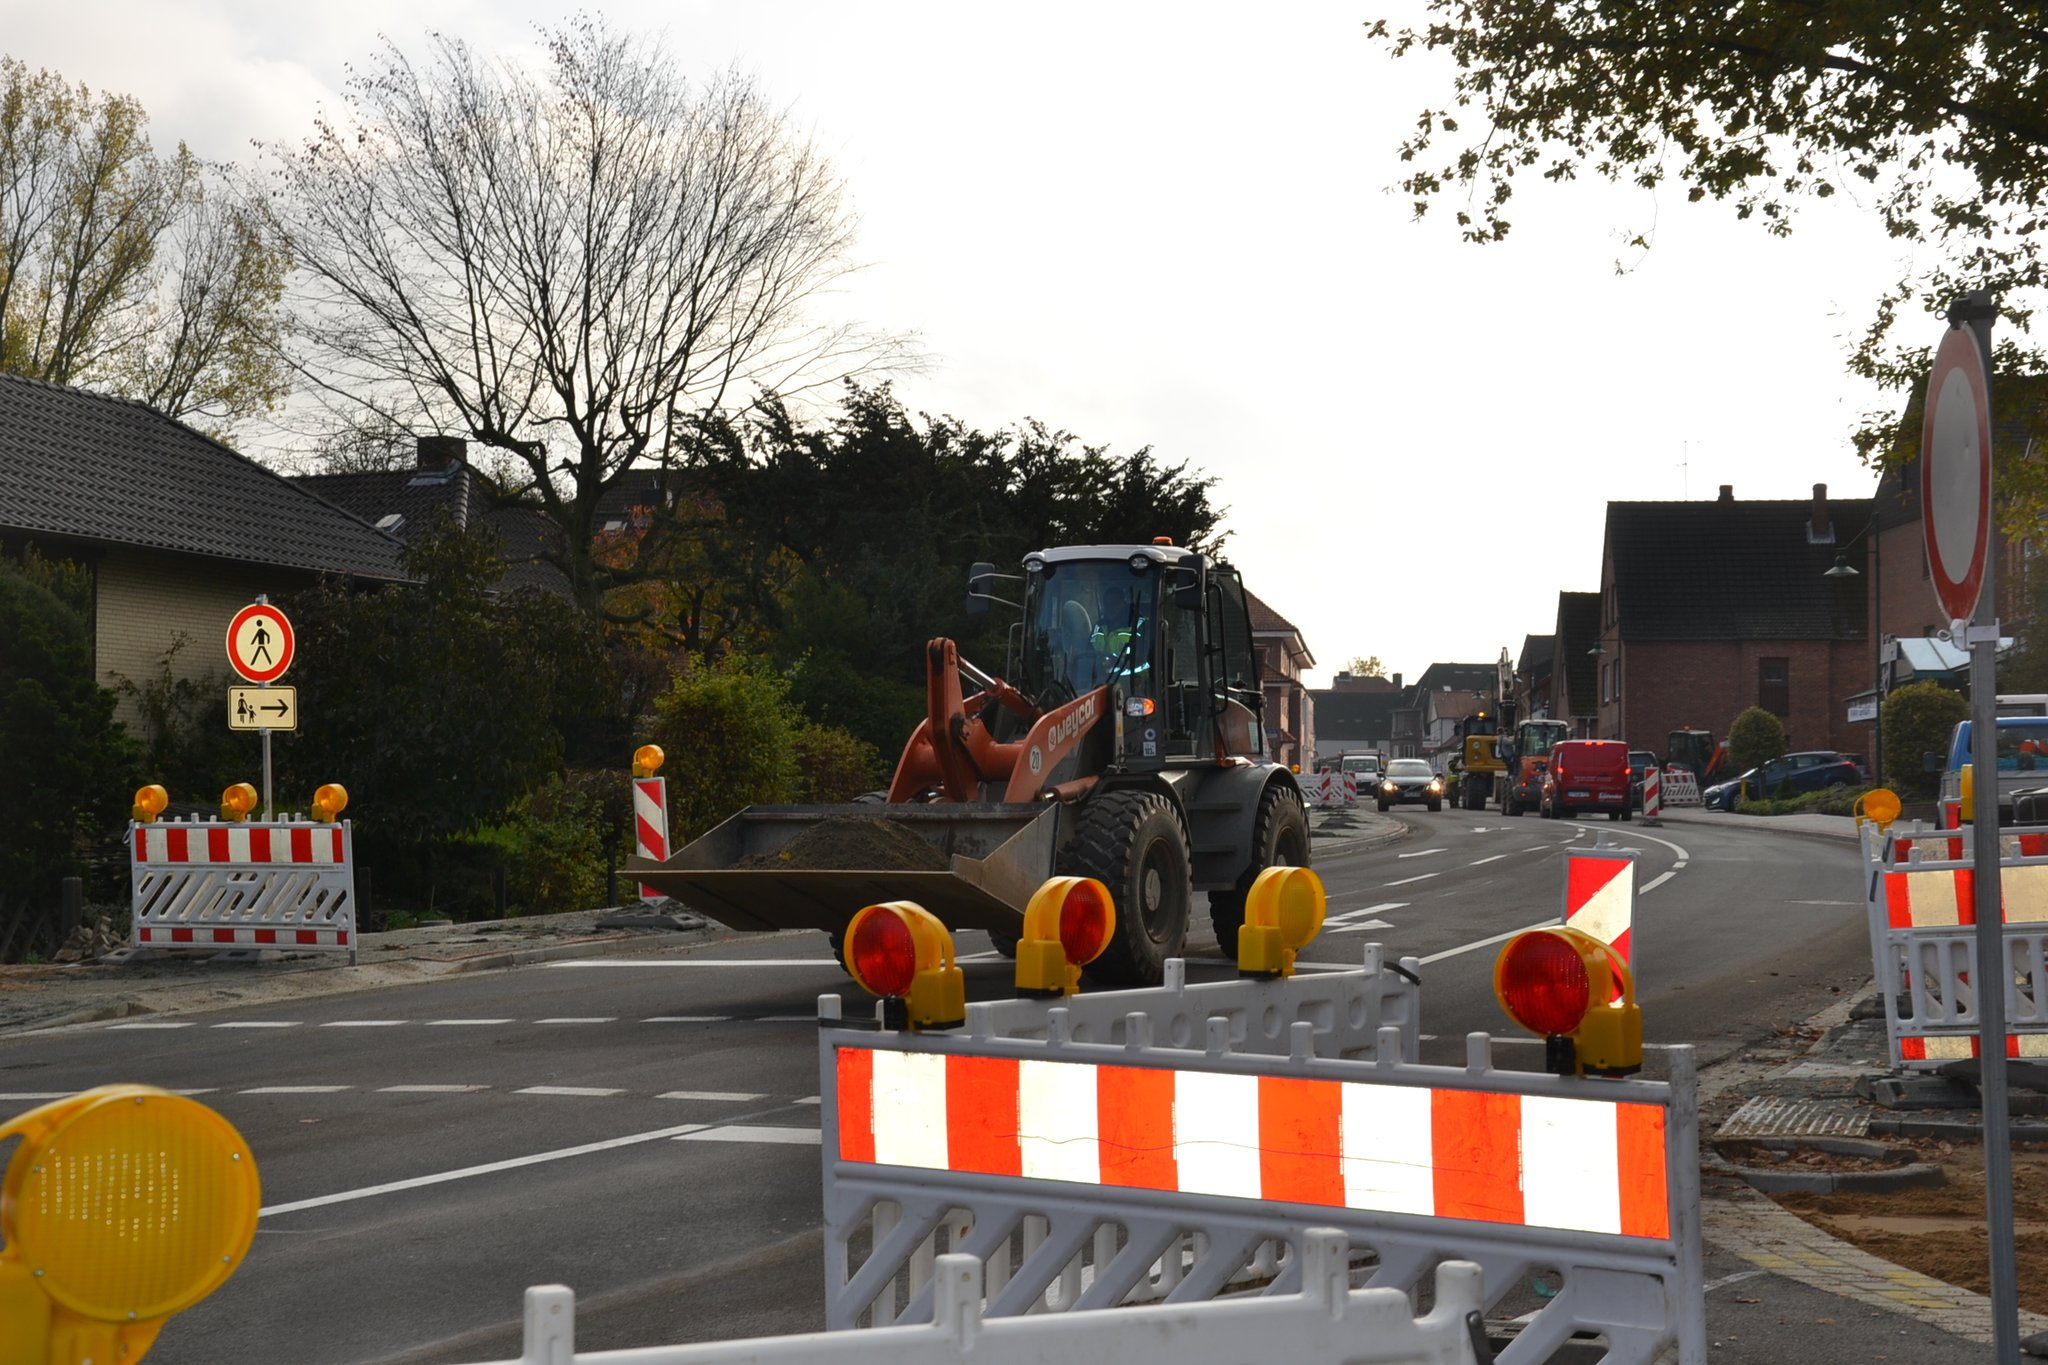 Herrenstraße: Bauarbeiten fast fertig - Harsefeld - Kreiszeitung Wochenblatt